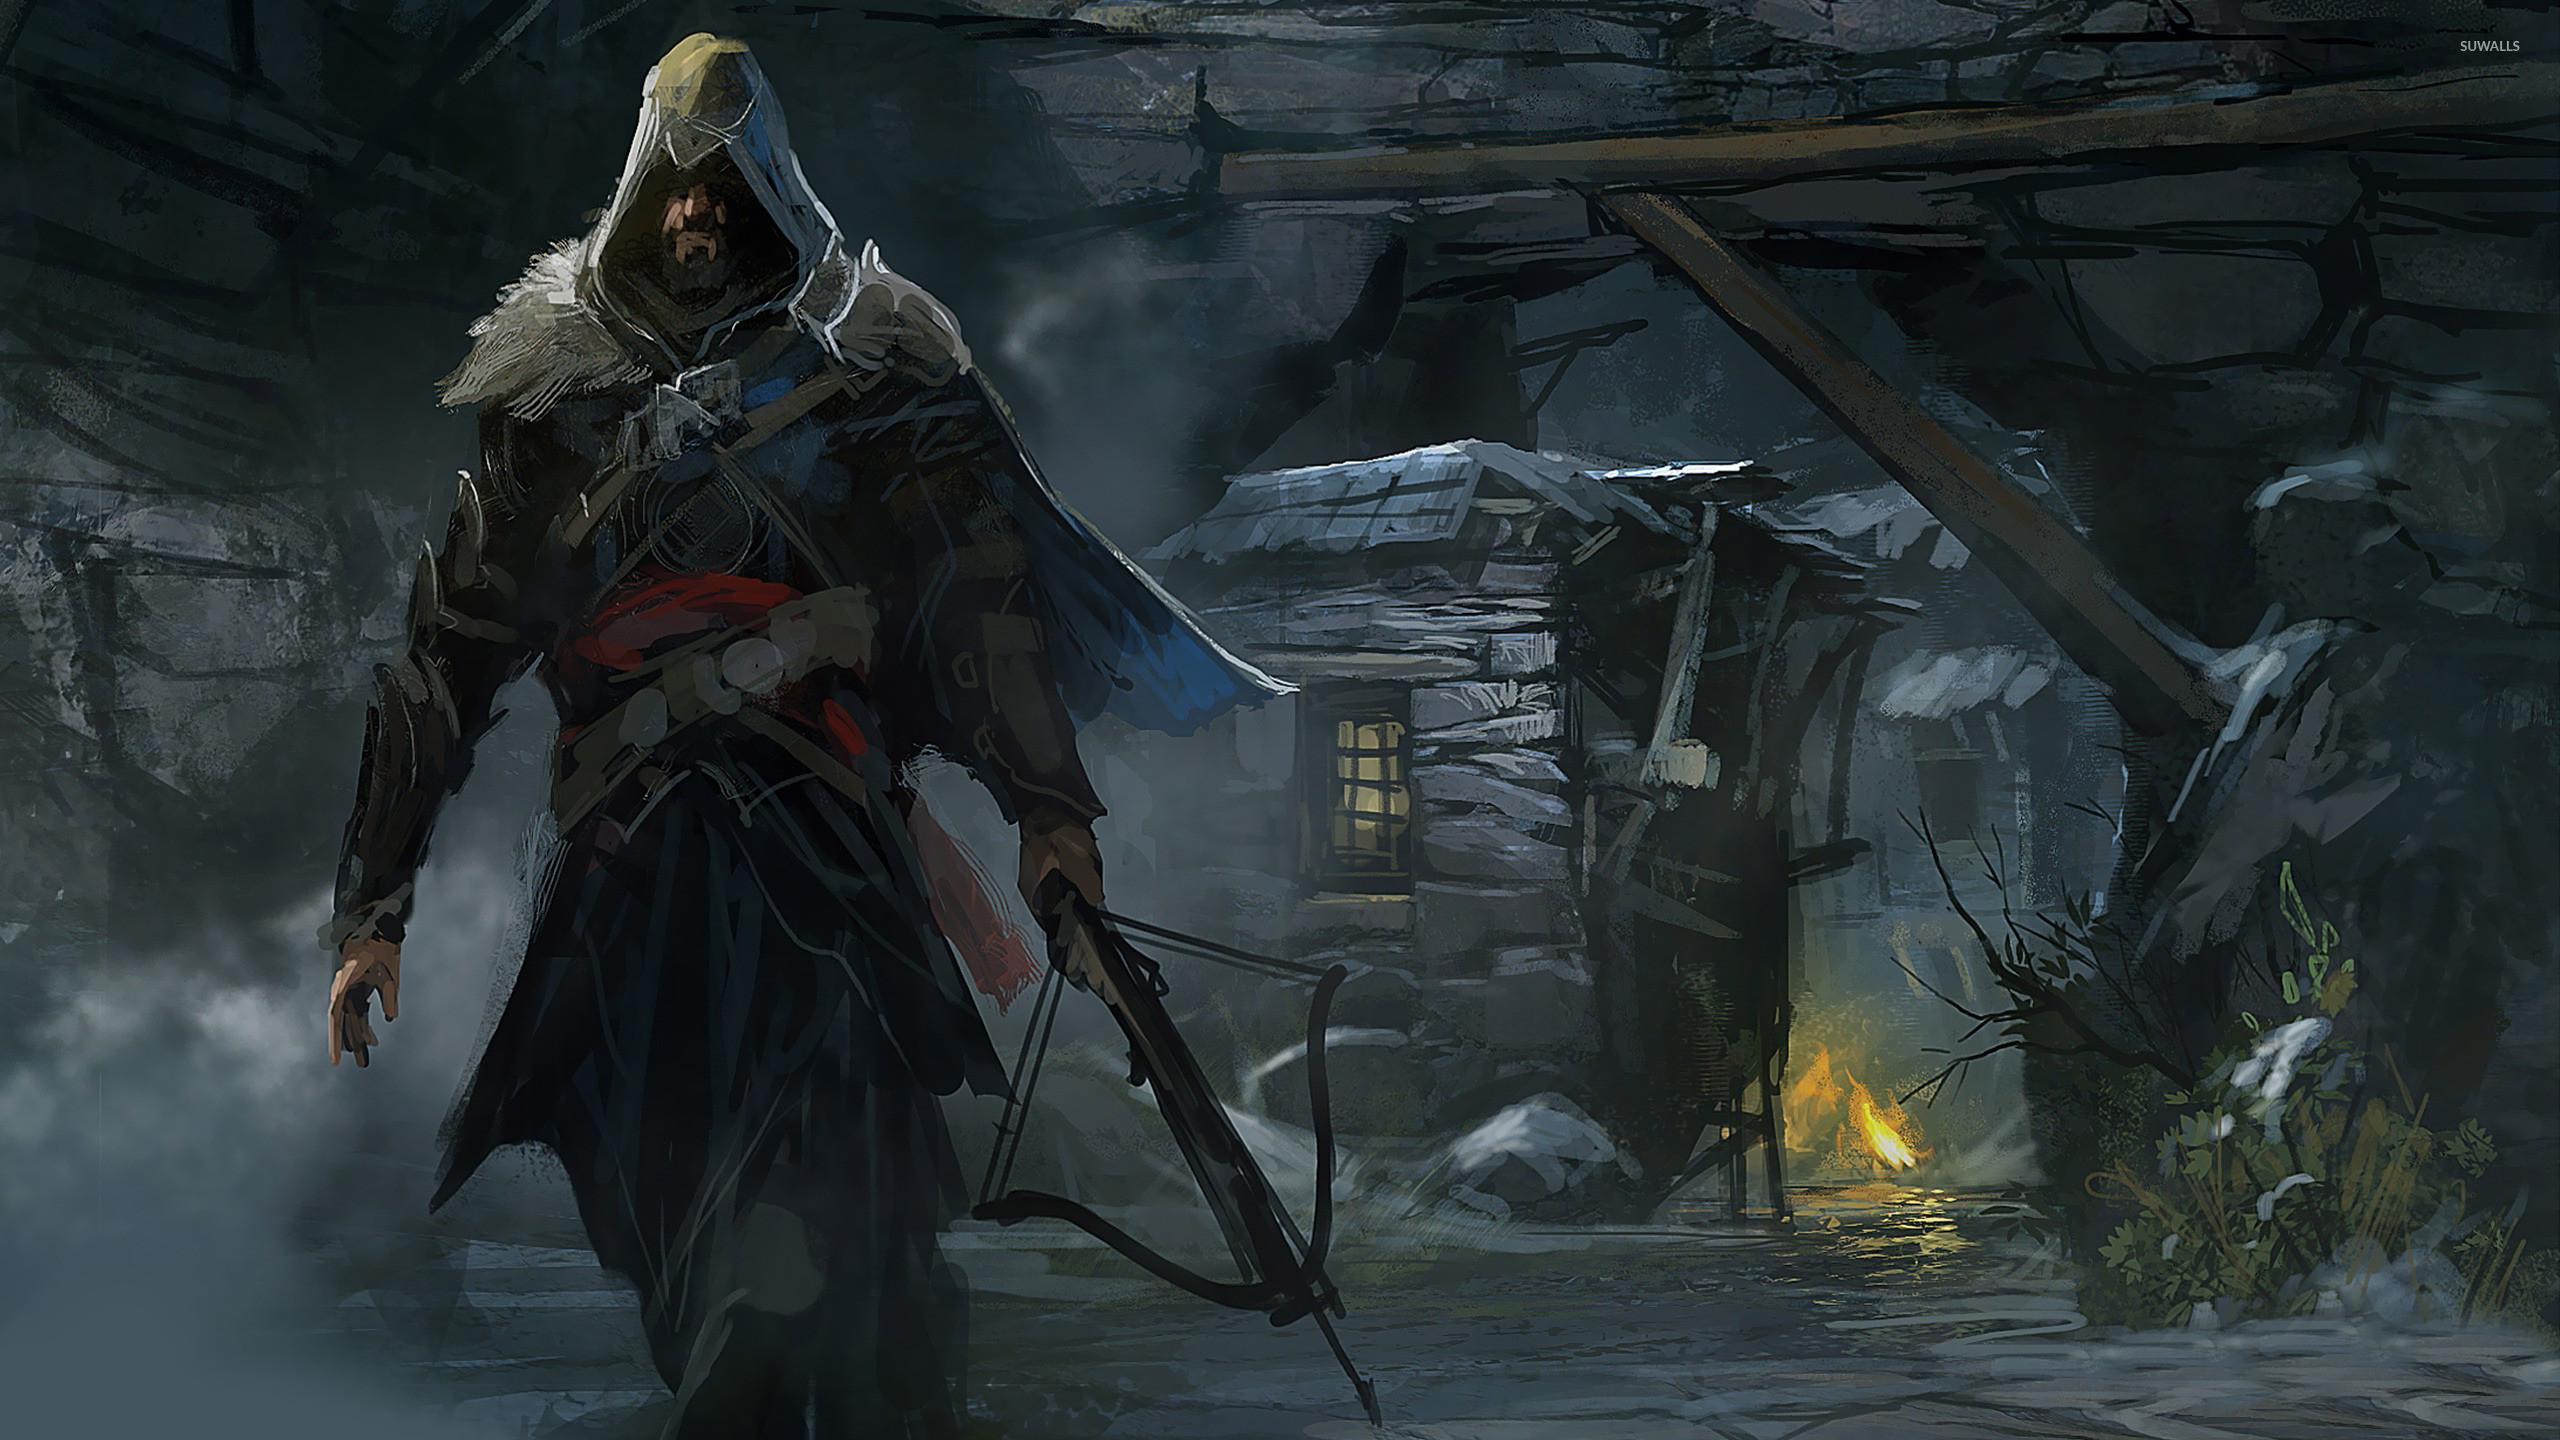 Assassin's Creed: Revelations [11] wallpaper